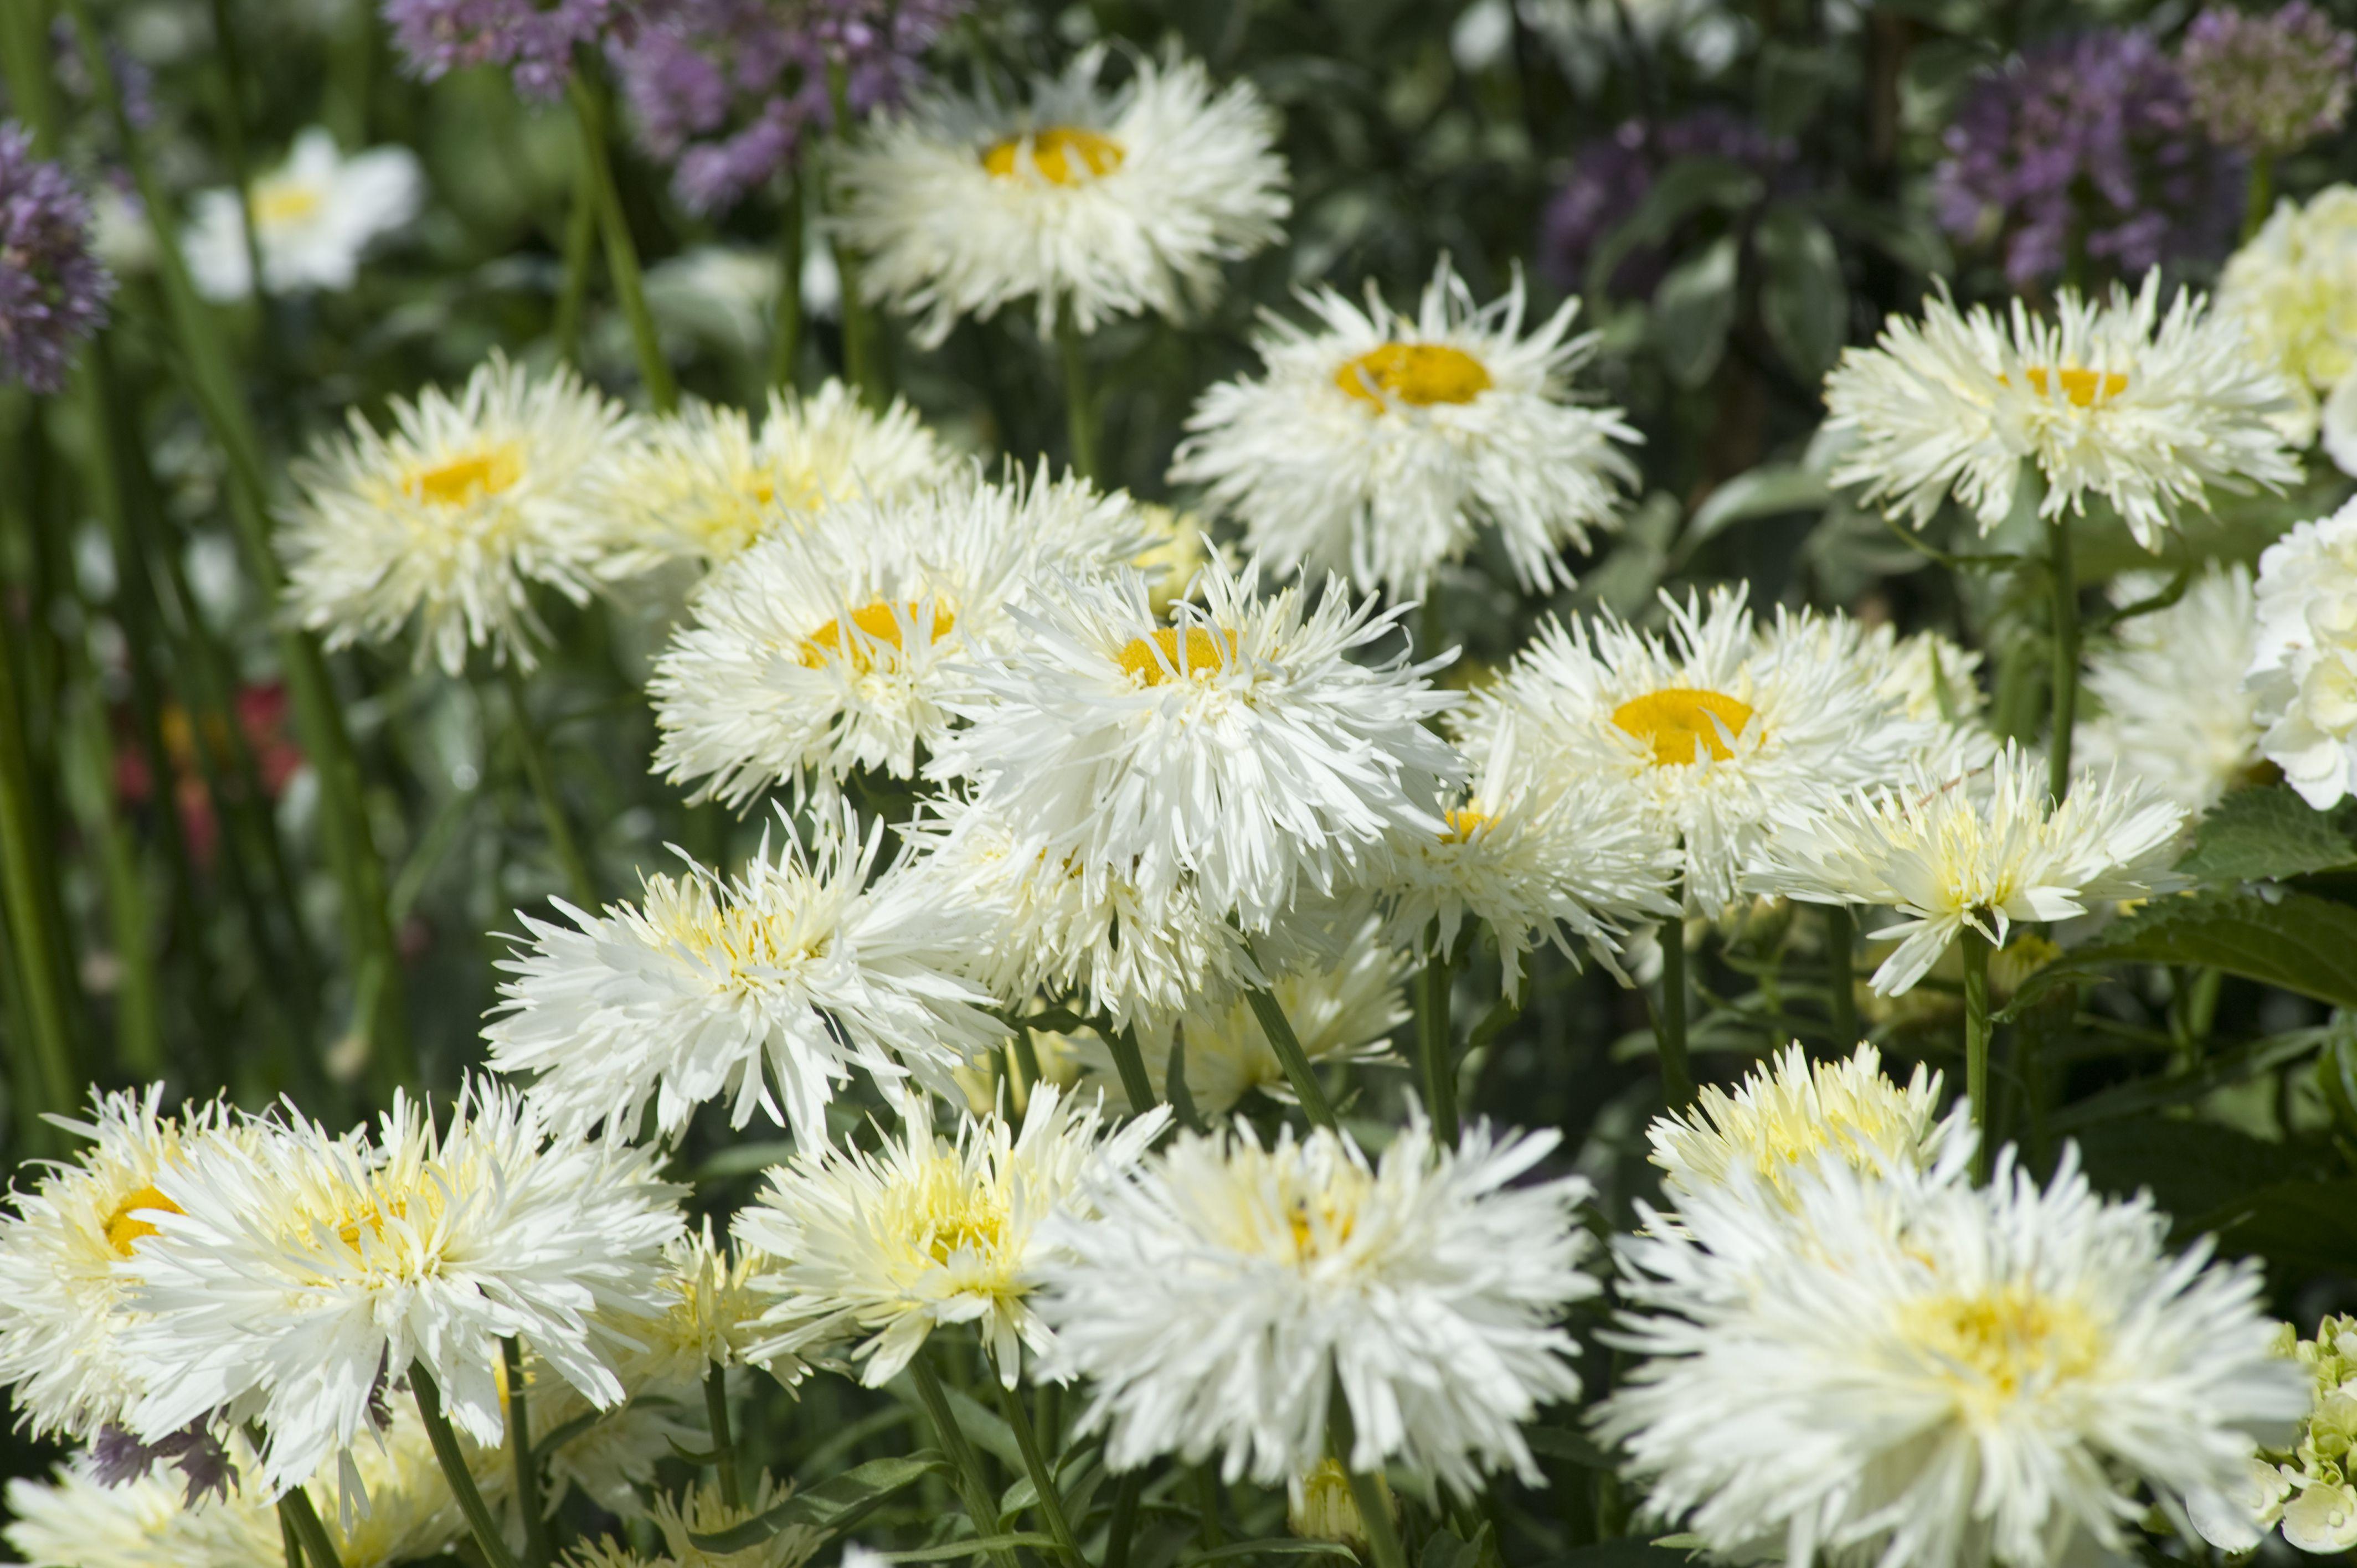 Daisy Leucanthemum maximus 'Goldrush'